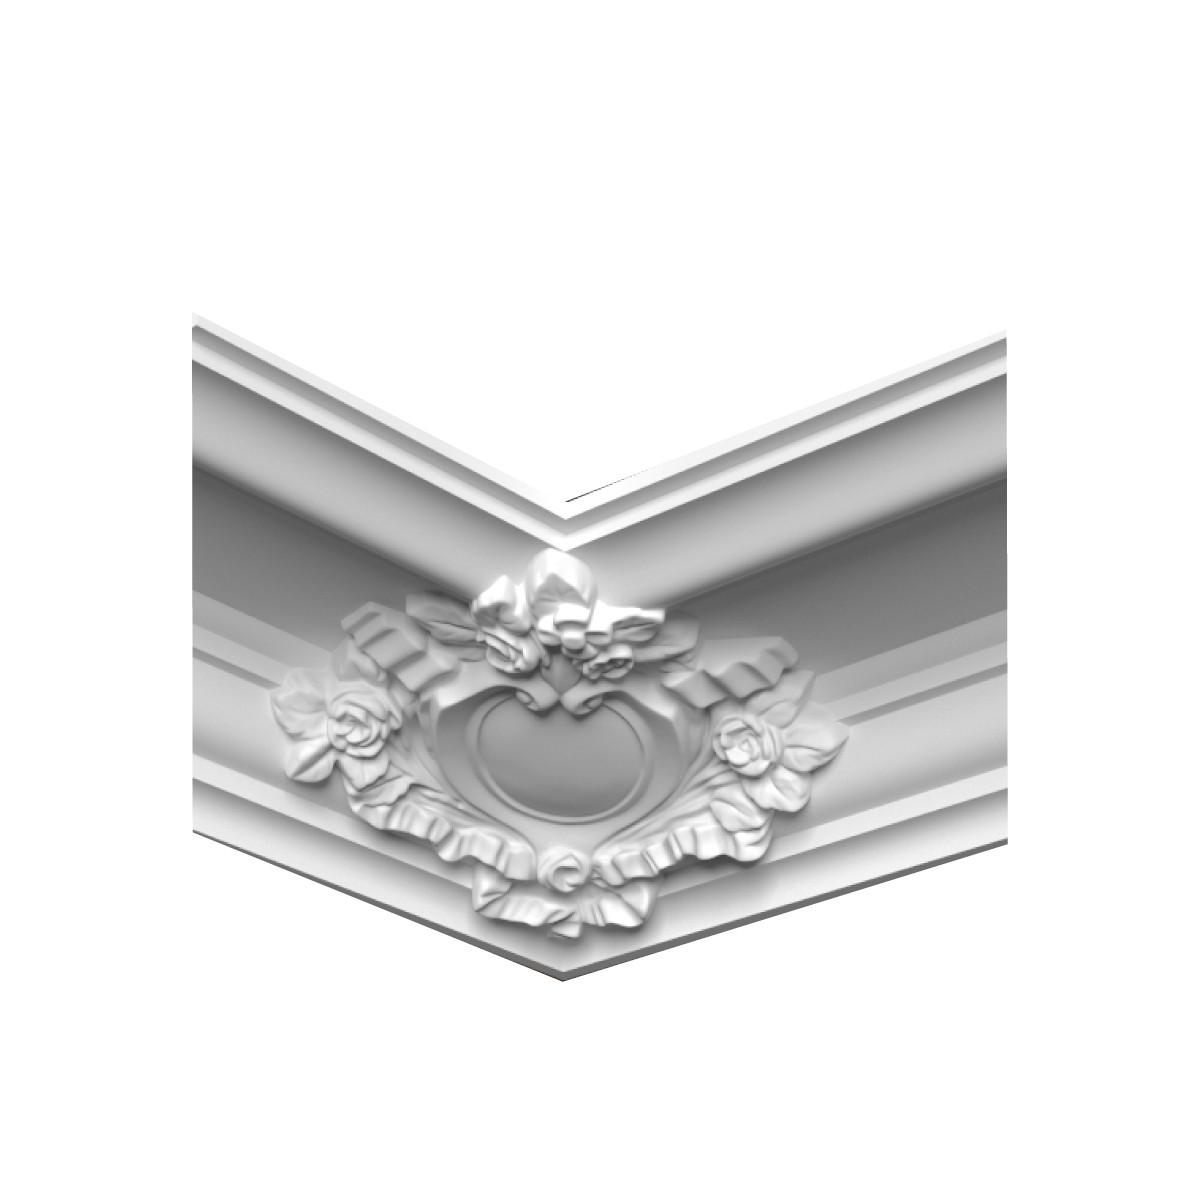 Гипсовая лепнина декоративный угол у-49 h251х251мм